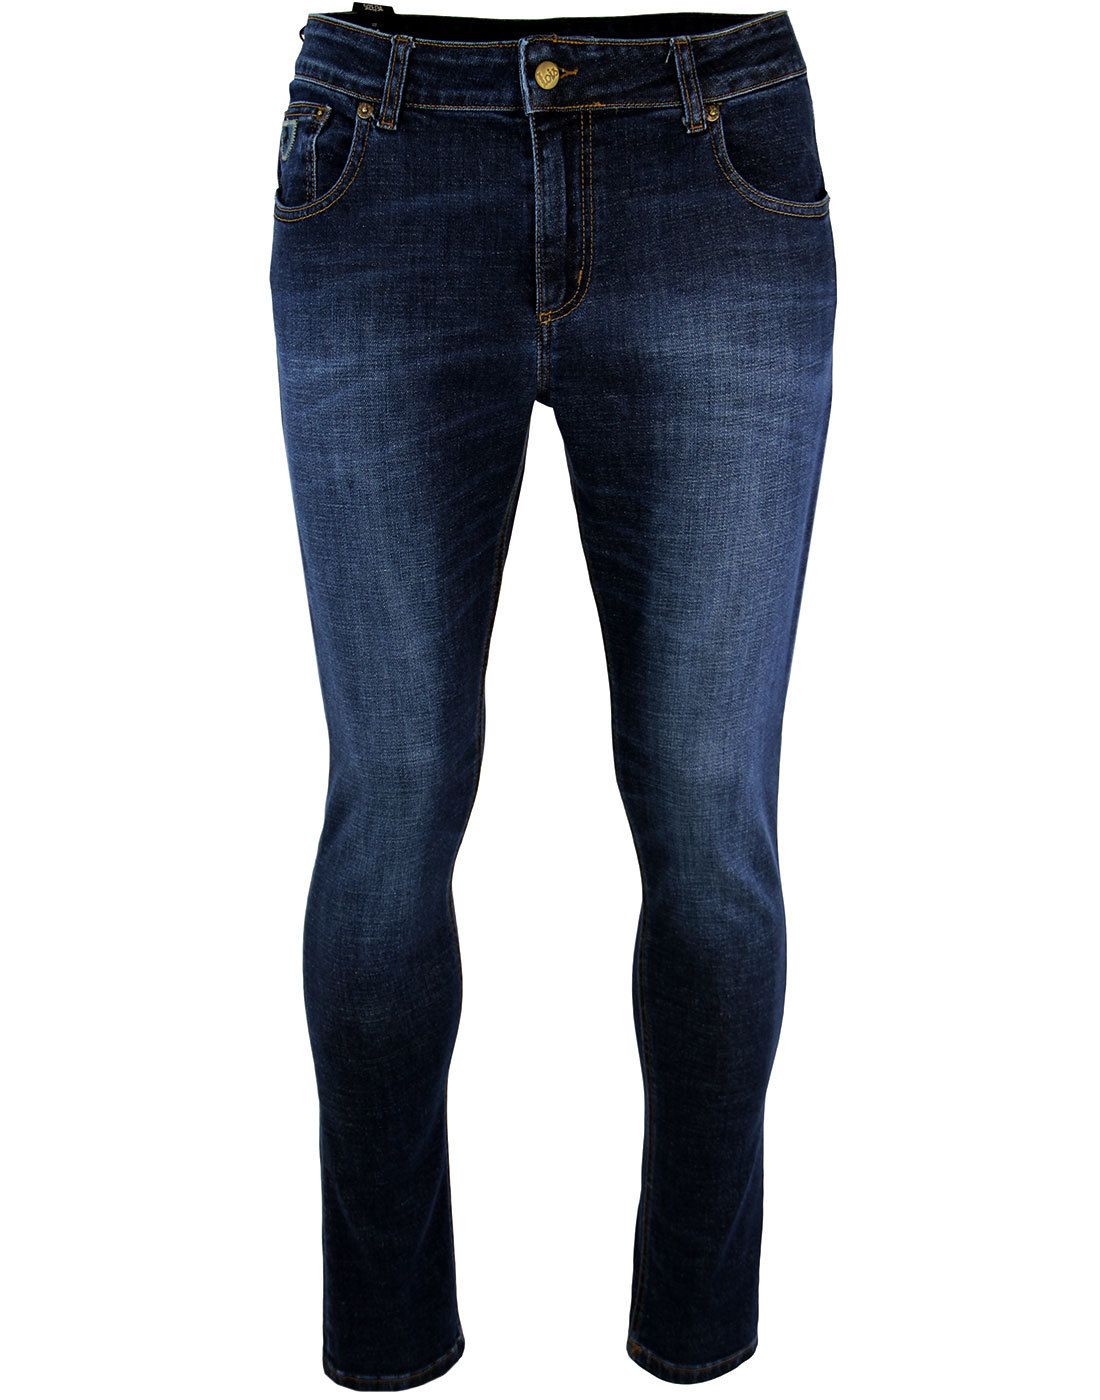 Sky LOIS Men's Mod Slim Fit Denim Jeans DARK STONE